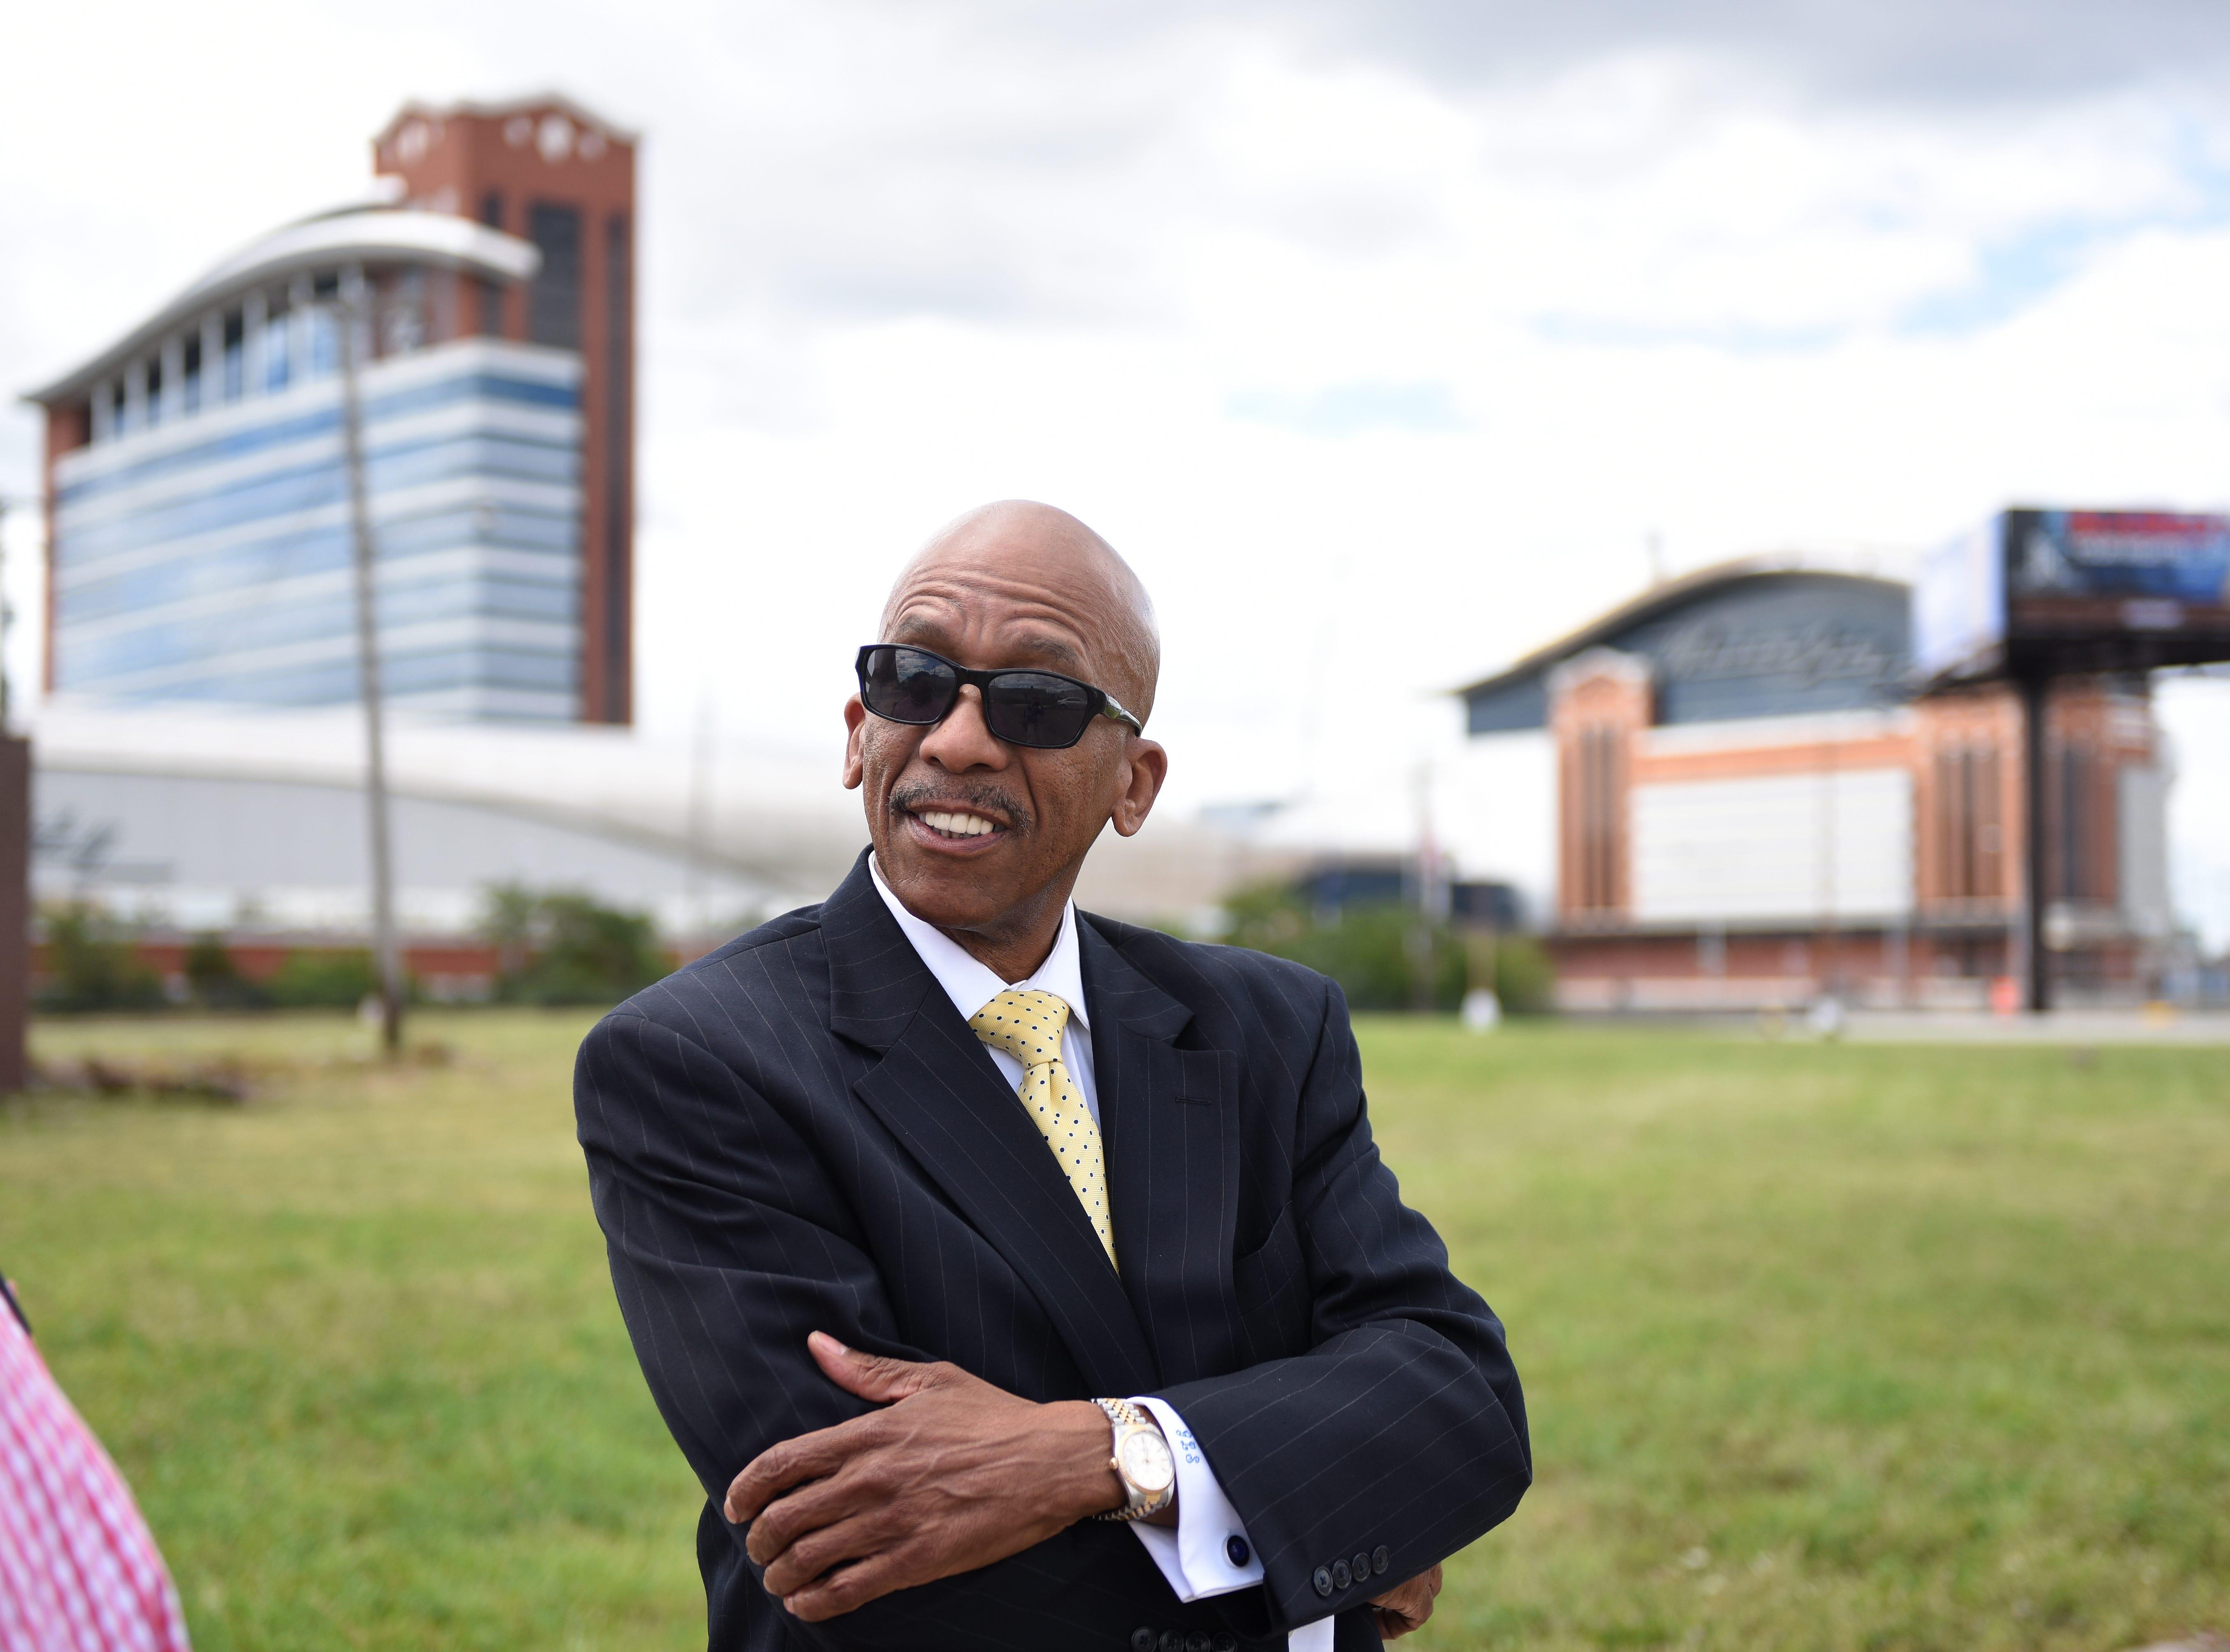 Motor city casino owner the economics of casino taxation